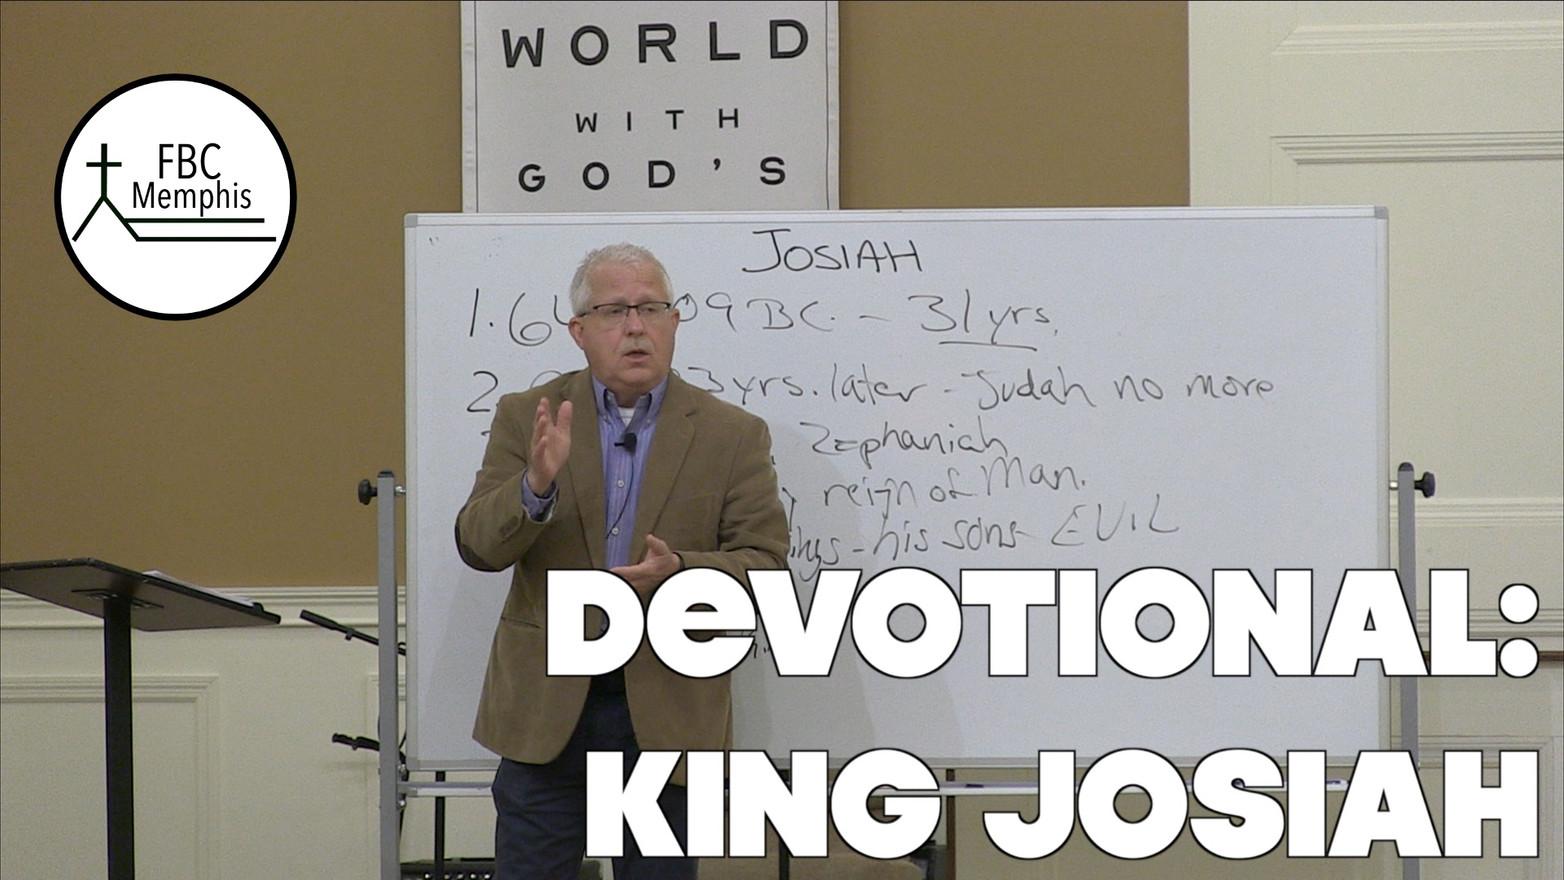 Wednesday Devotional: King Josiah